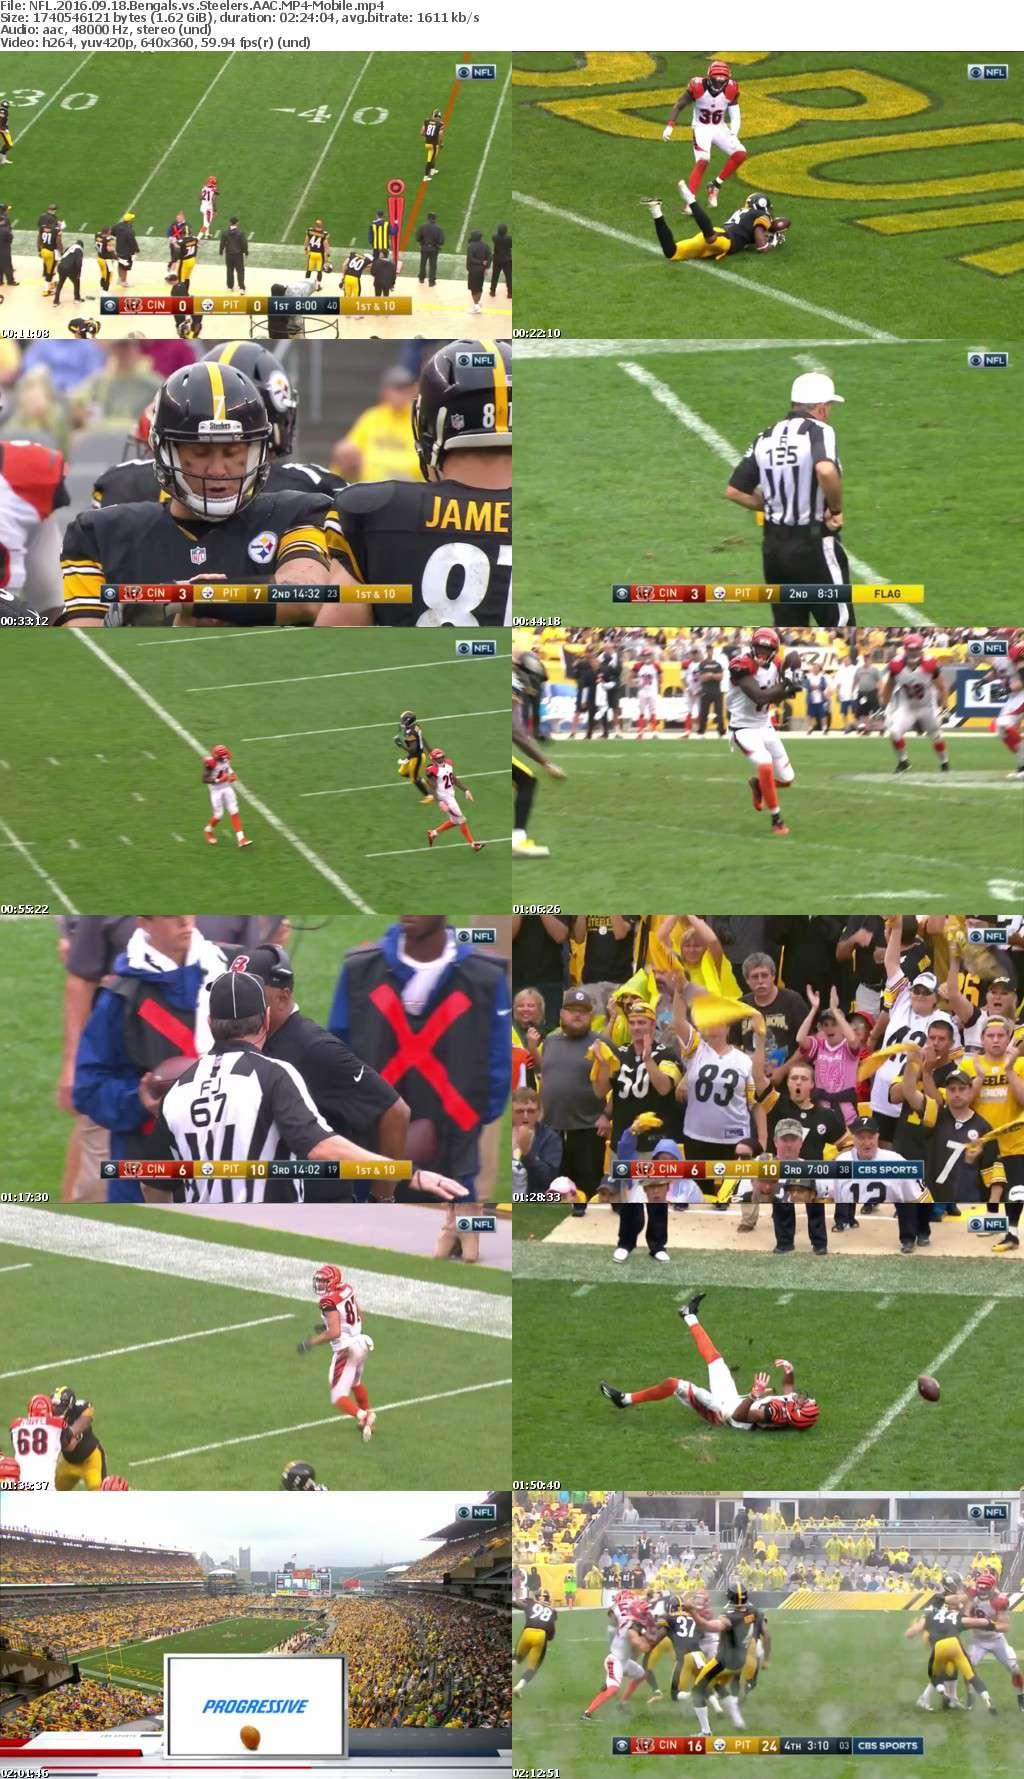 NFL 2016 09 18 Bengals vs Steelers AAC-Mobile